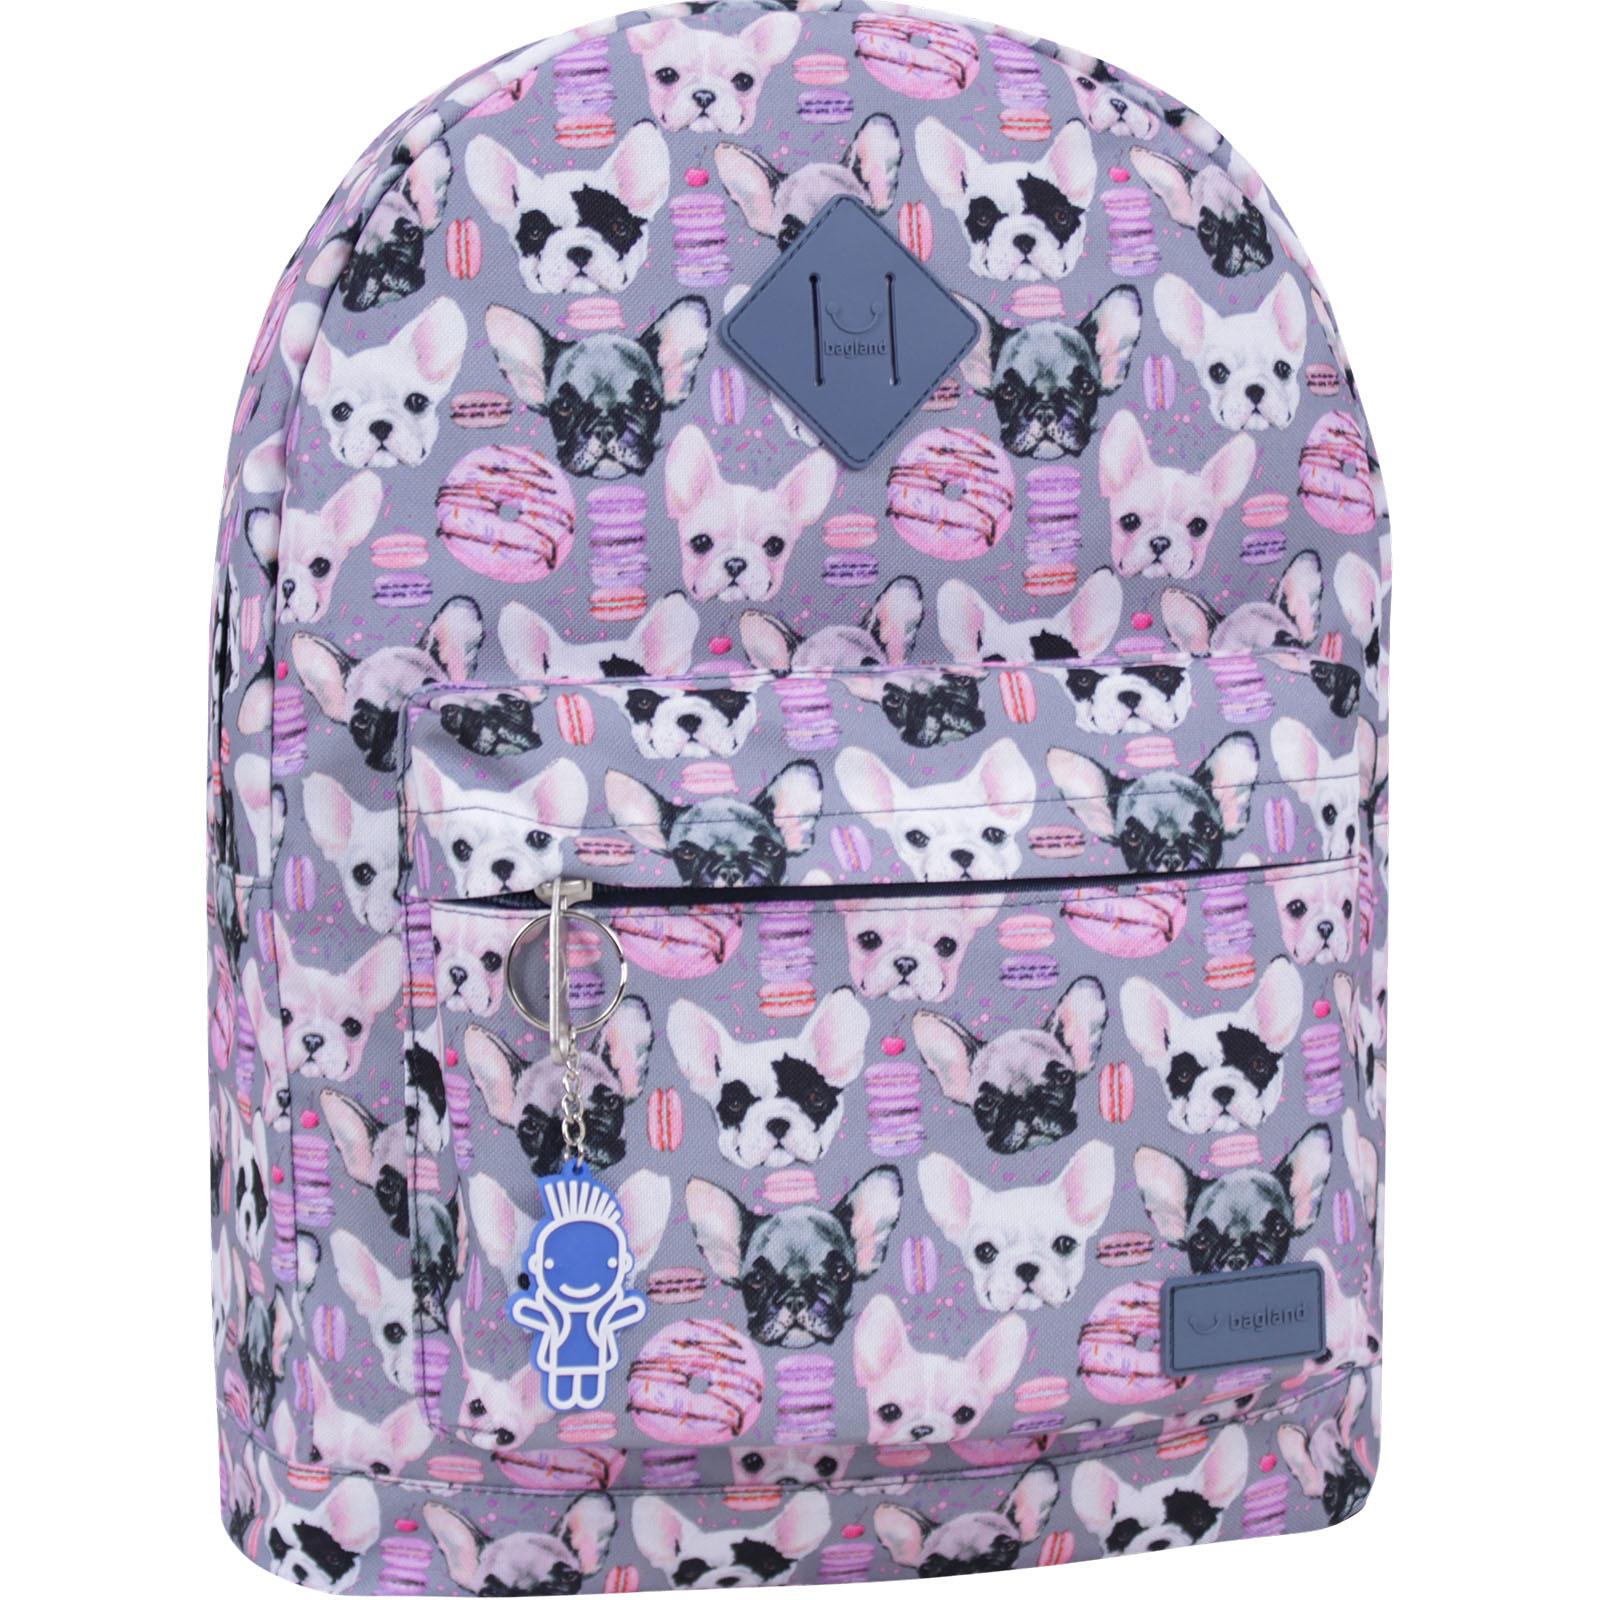 Городские рюкзаки Рюкзак Bagland Молодежный 17 л. сублимация 144 (00533664) IMG_8169-00533суб144-1600.jpg